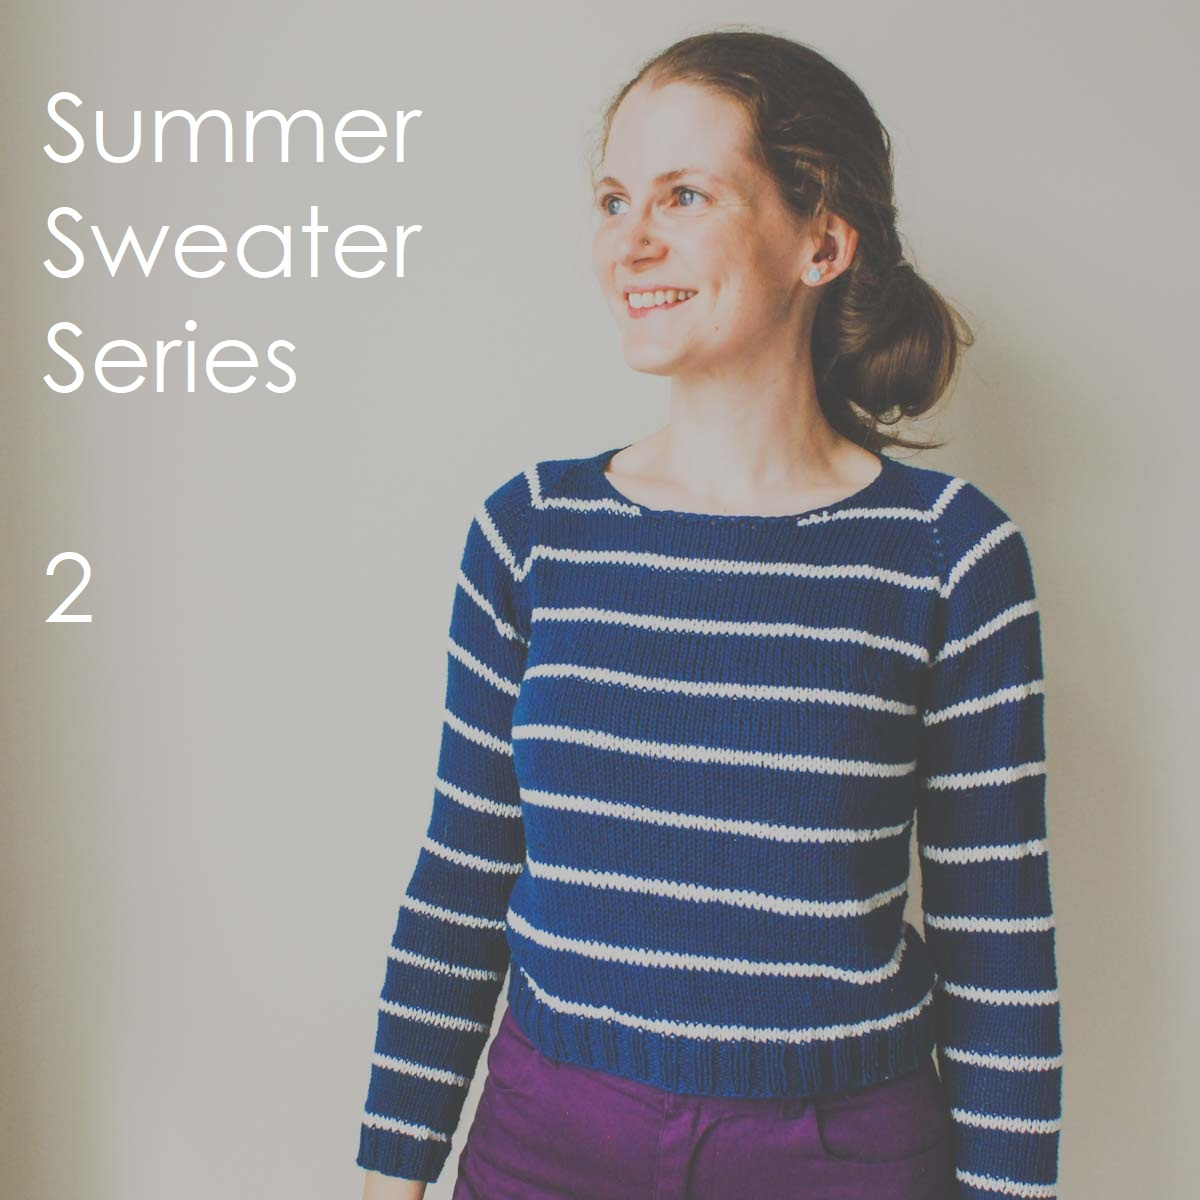 Summer Sweater Series 2